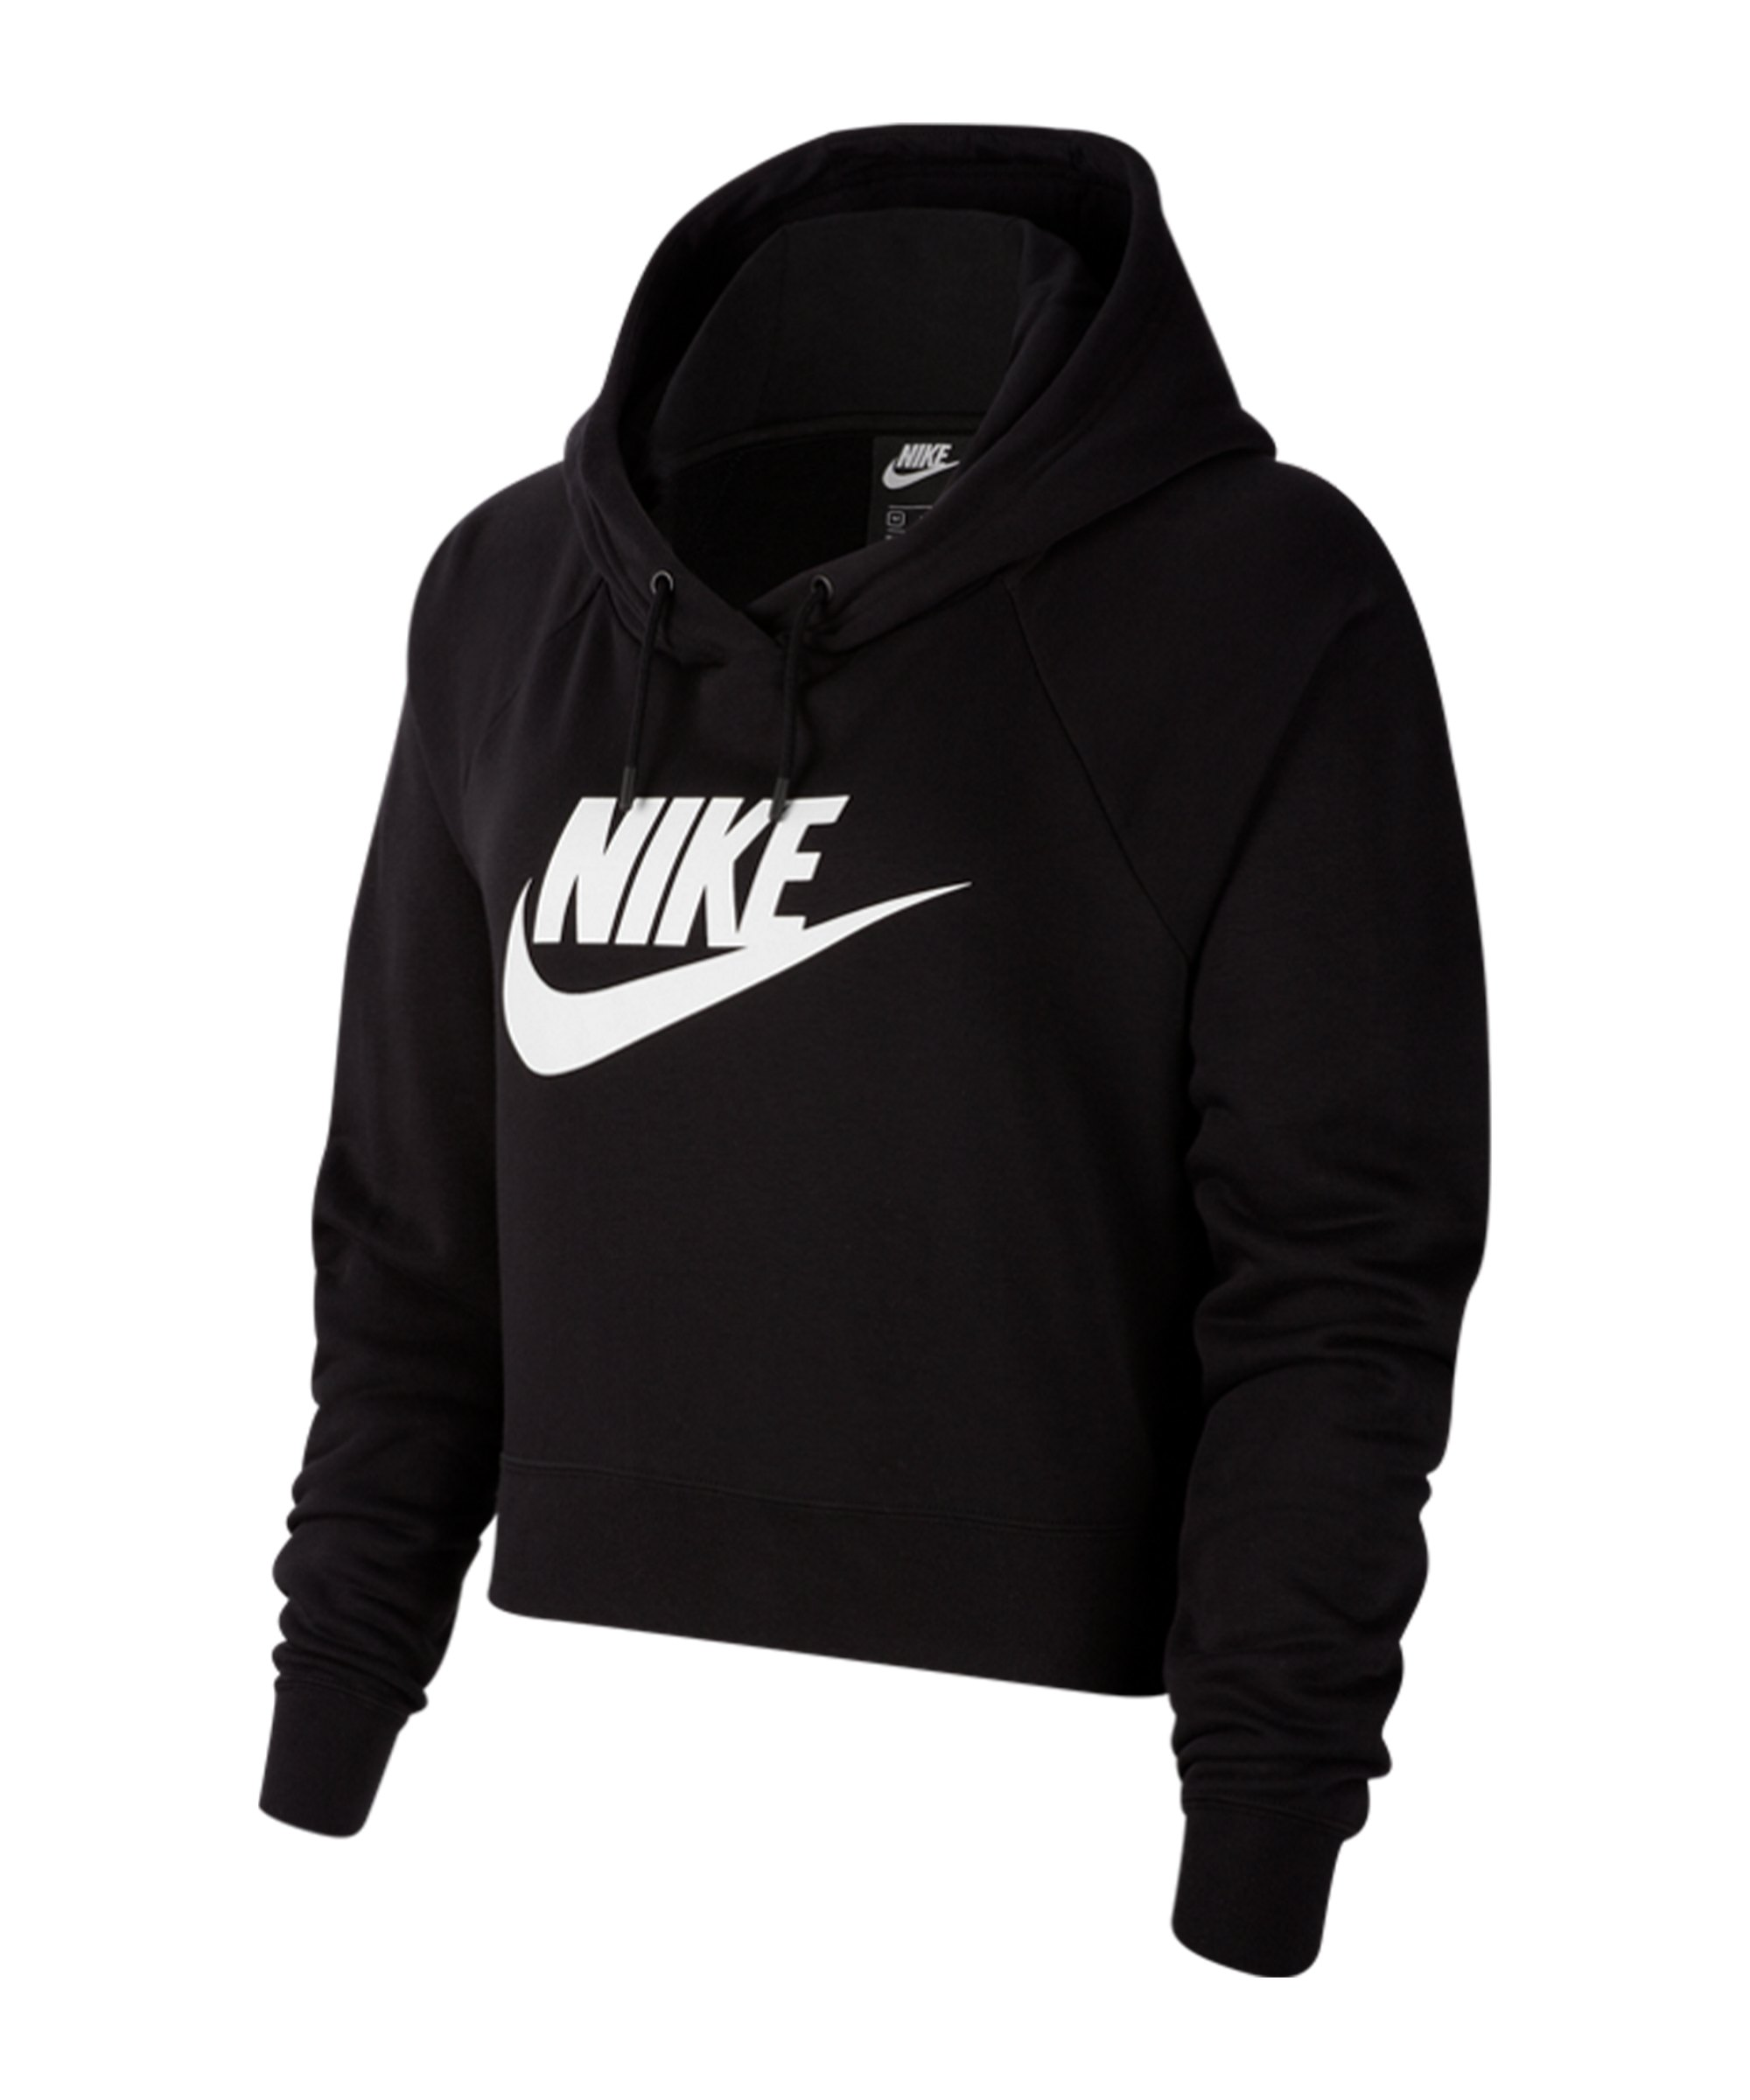 Nike Essential Cropped Hoody Damen Schwarz F010 - schwarz